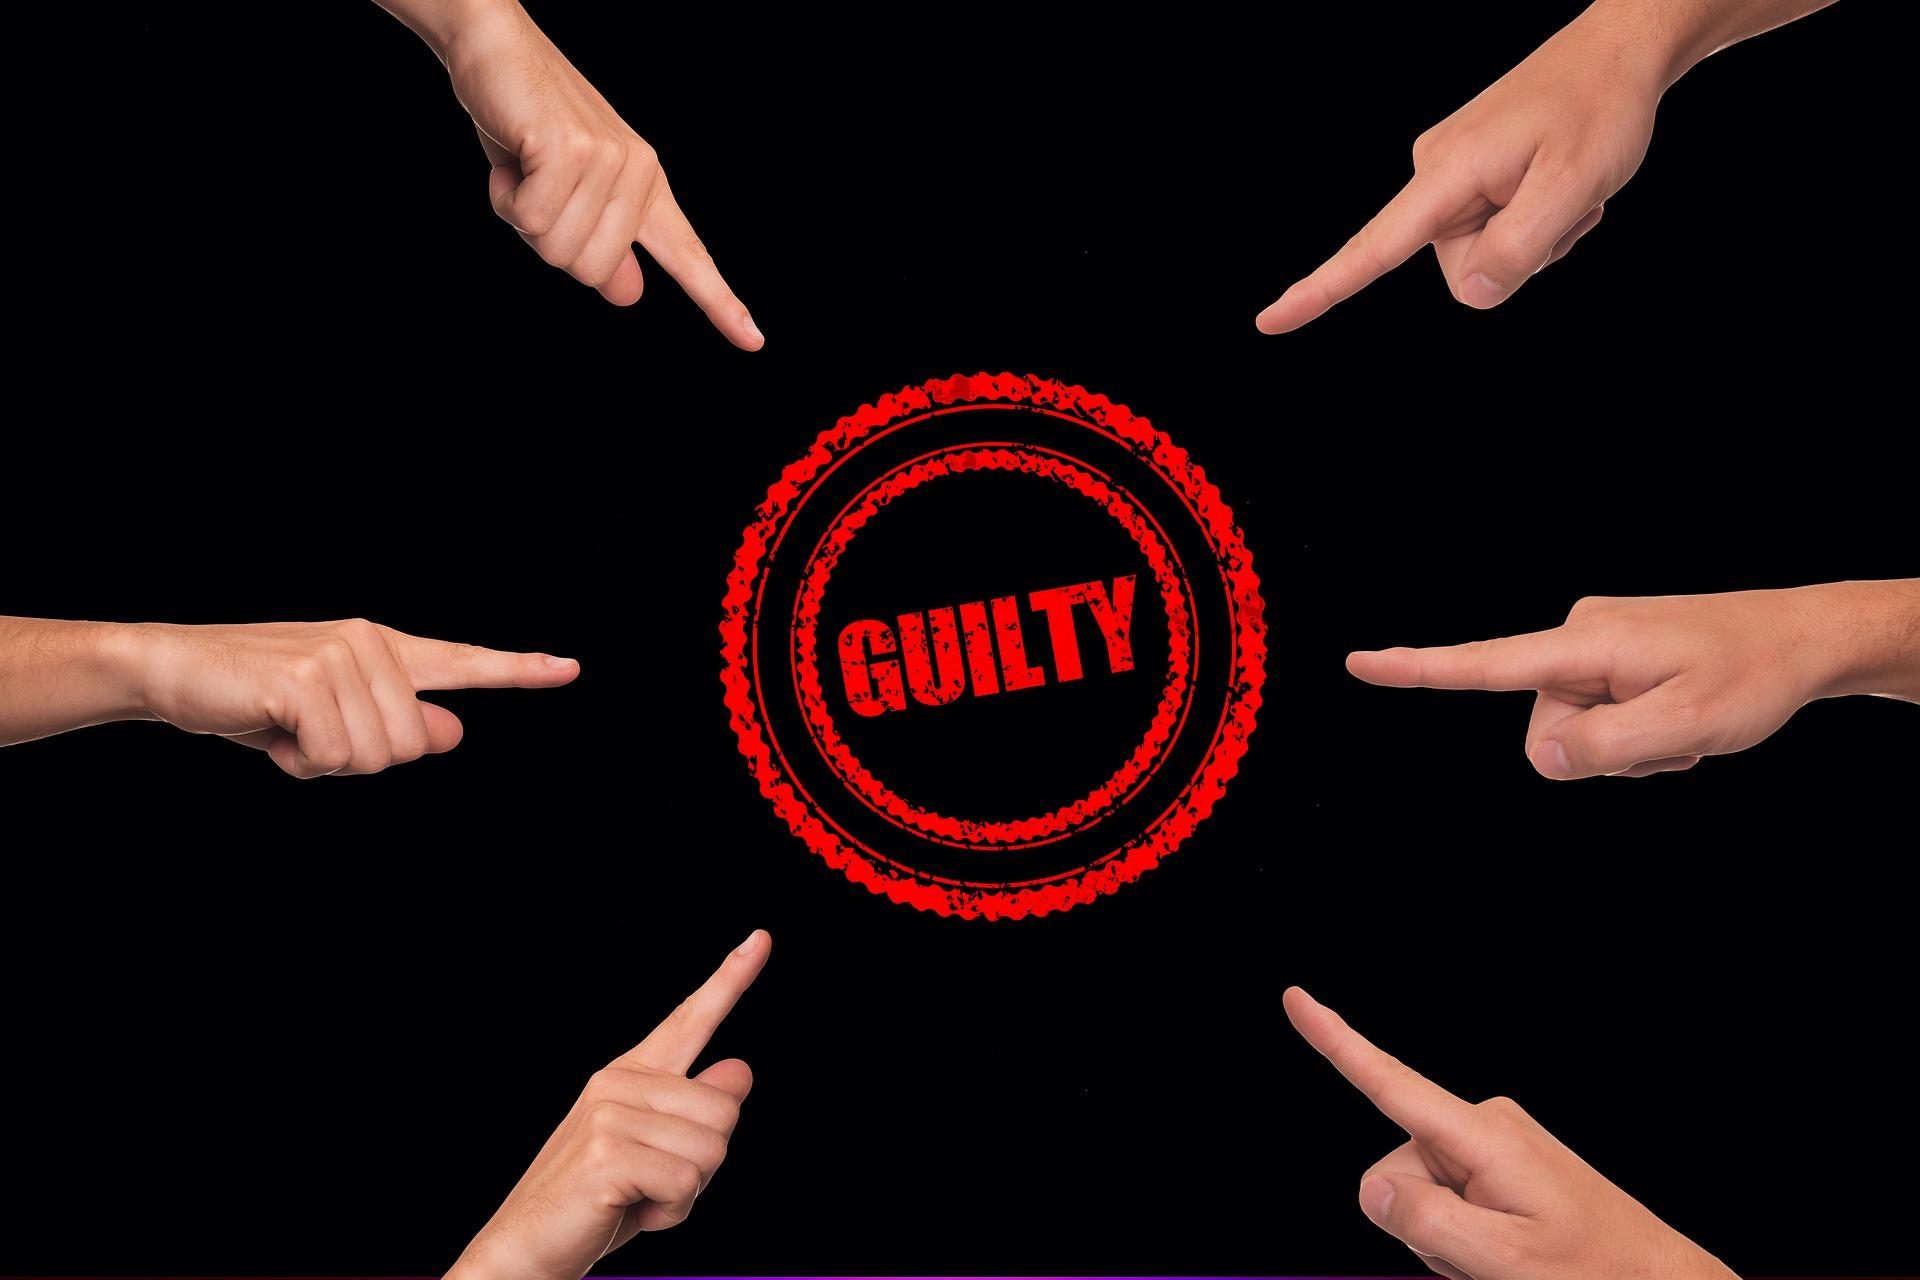 Ex-Mortgage Pro Awaiting Fraud Sentence Was Avid Art Collector